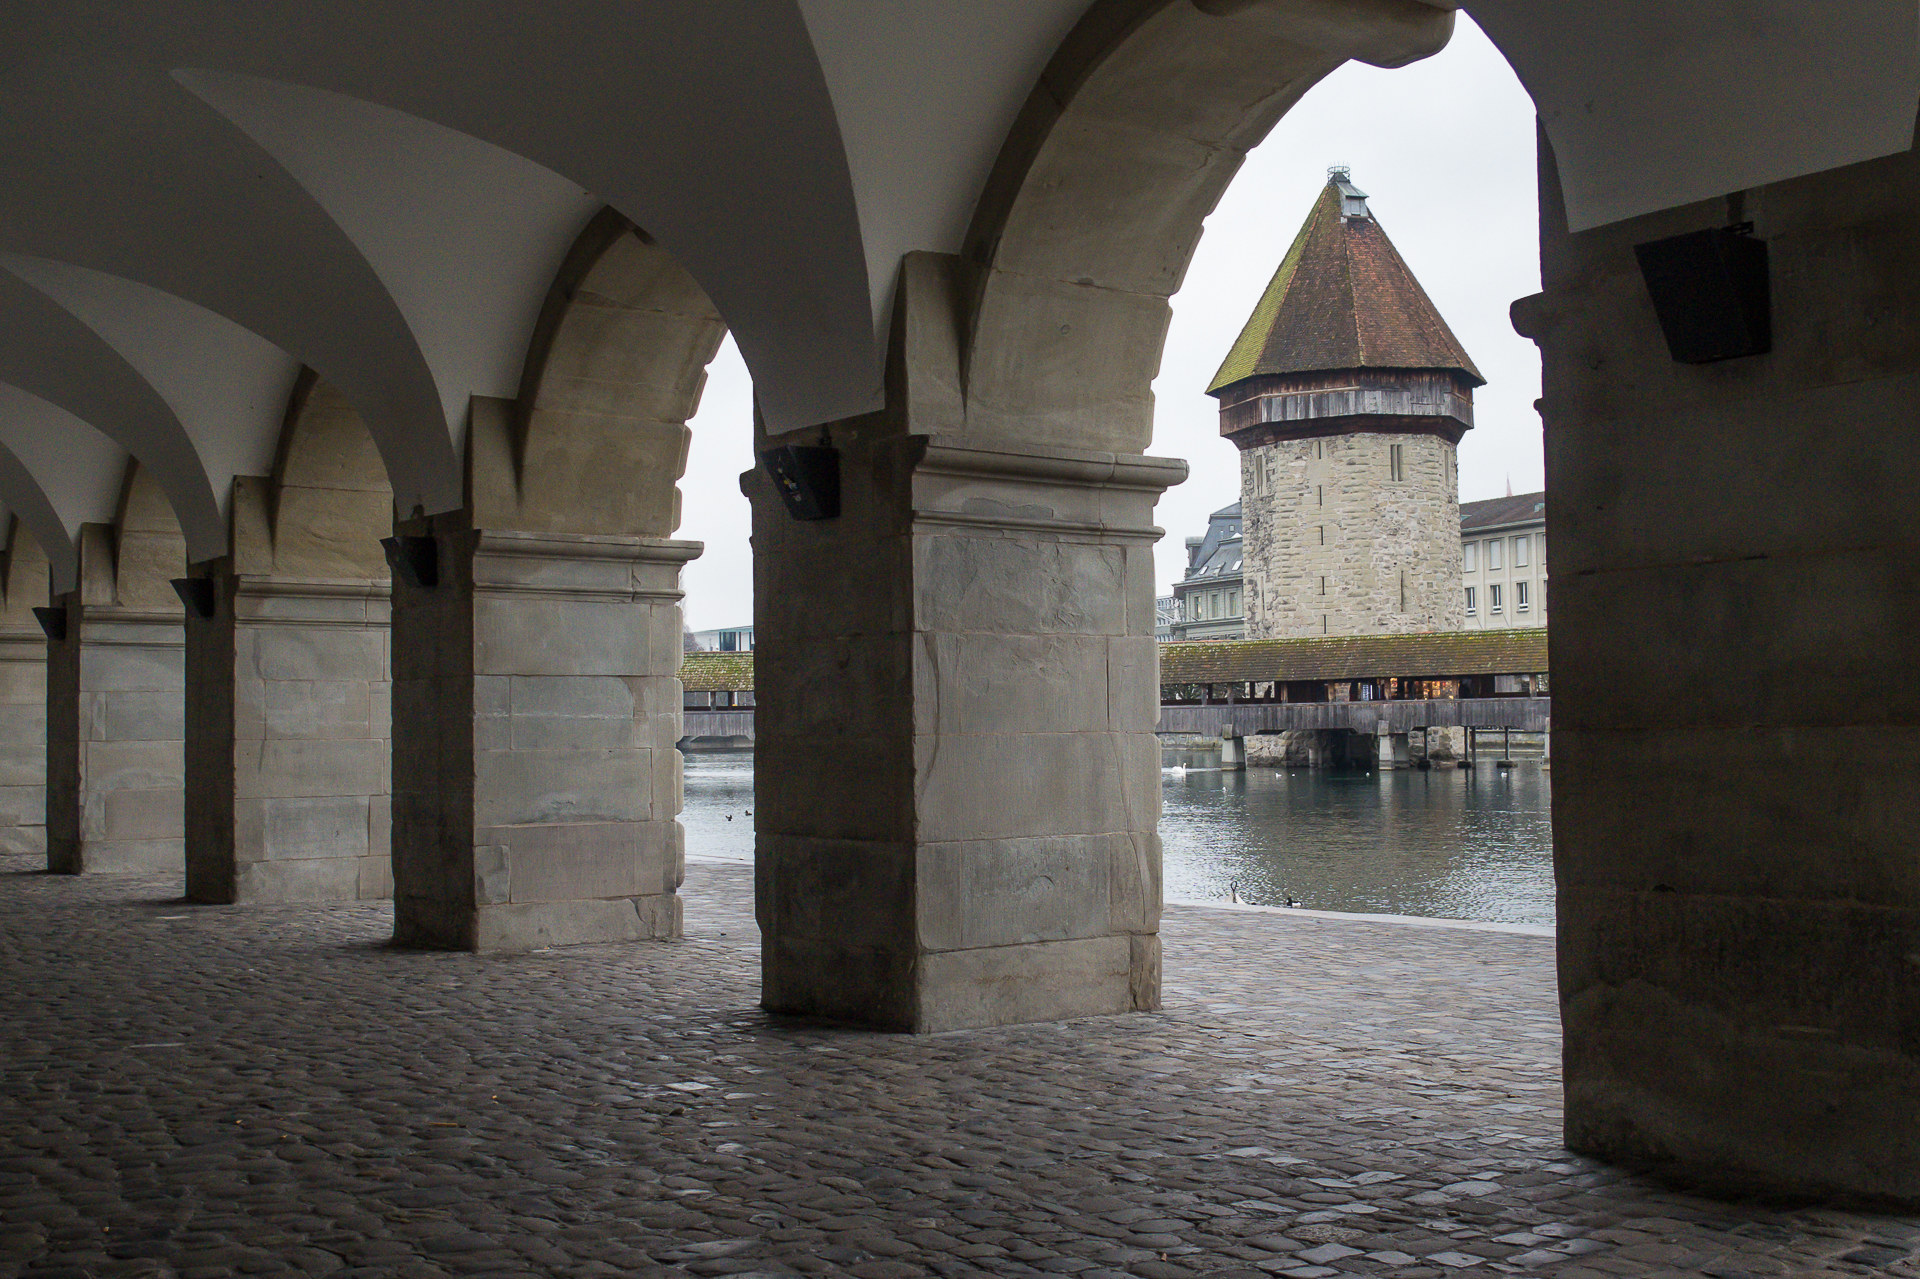 Elias Meier | Meine Politik | Kapellbrücke, Luzern